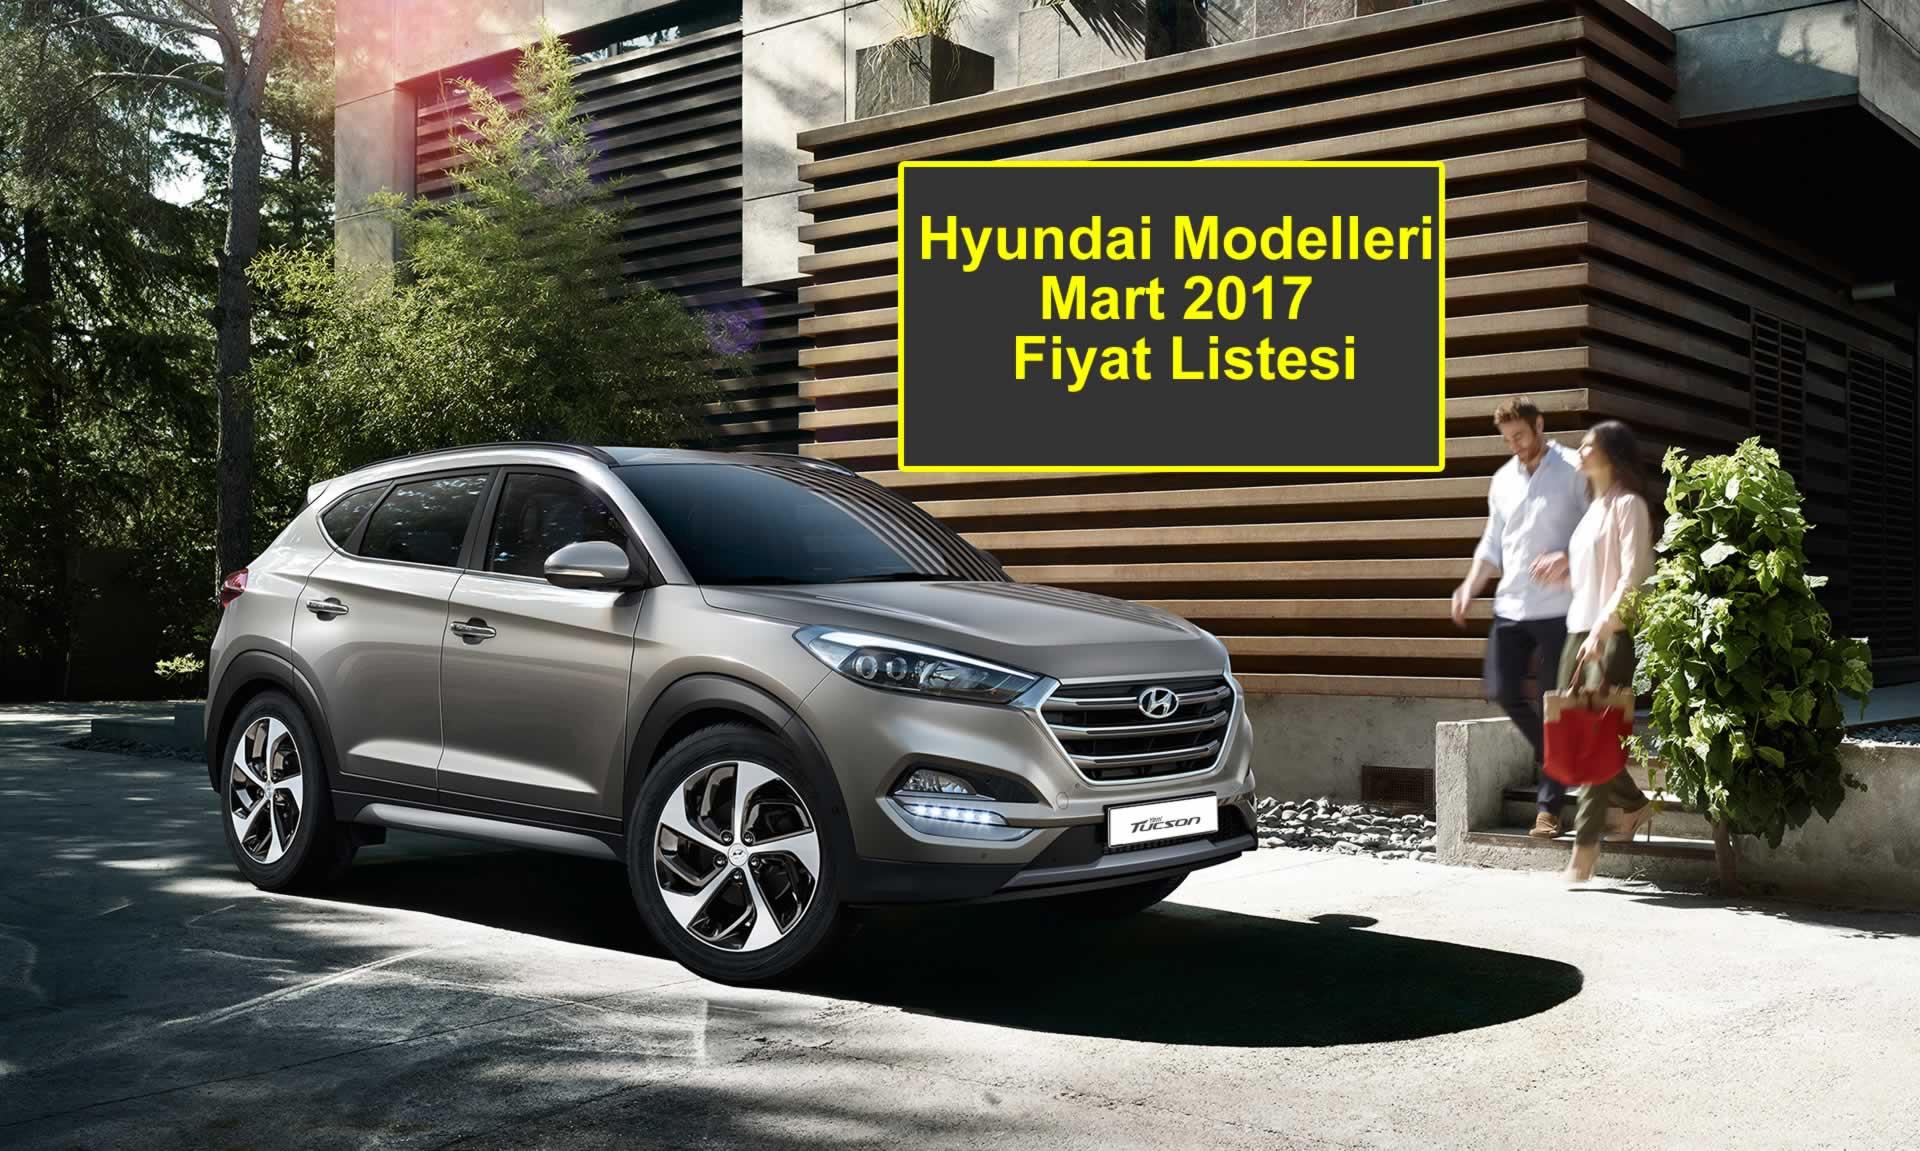 Hyundai Modelleri Mart 2017 Fiyat Listesi Oto Kokpit